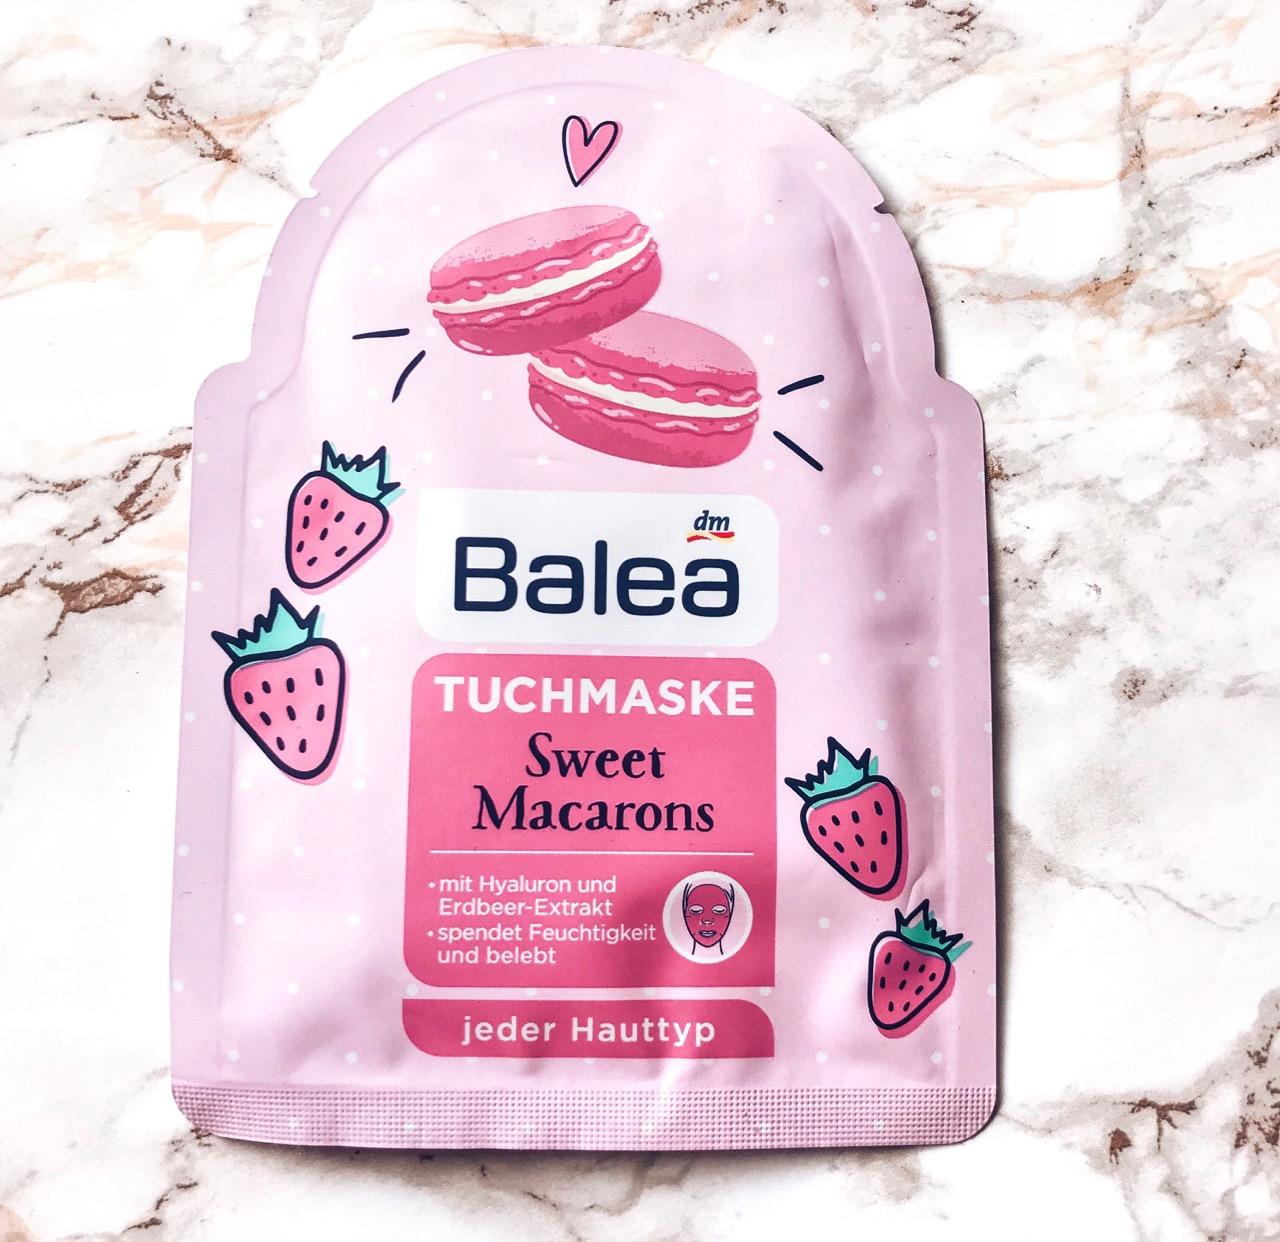 Balea Tuchmasken Sweet Macarons